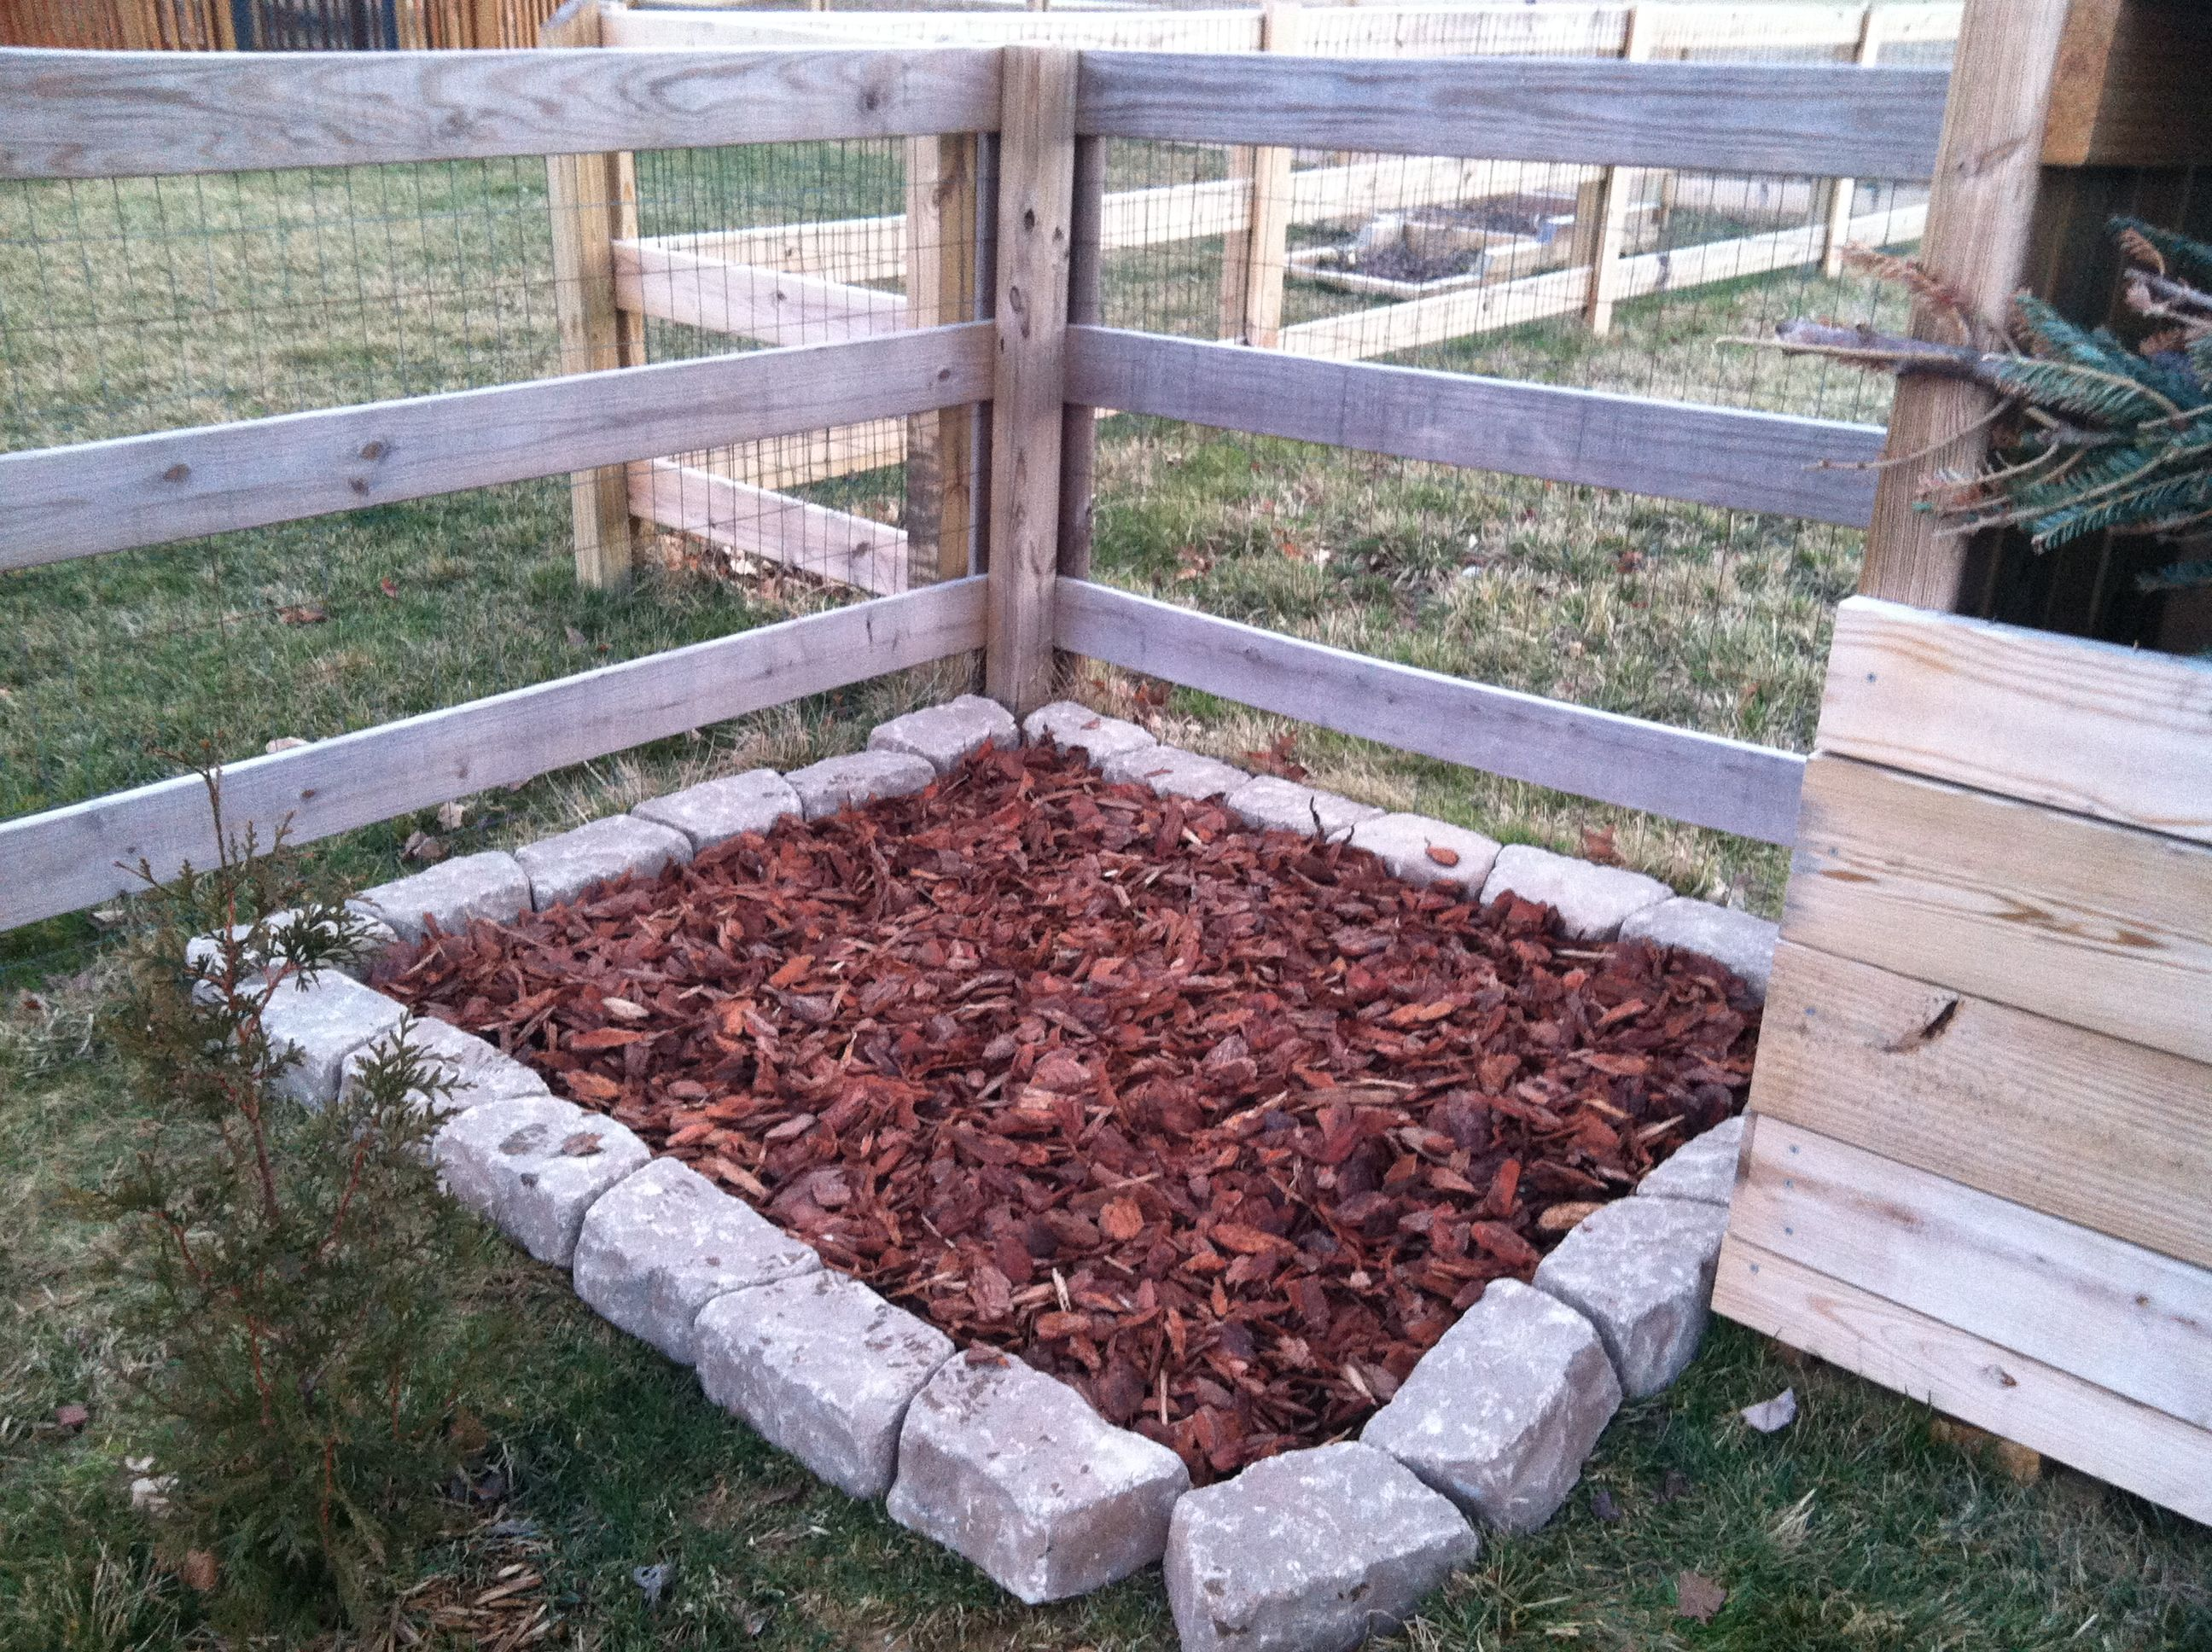 Designated Dog Bathroom Landscaping Bricks Cardboard To Kill